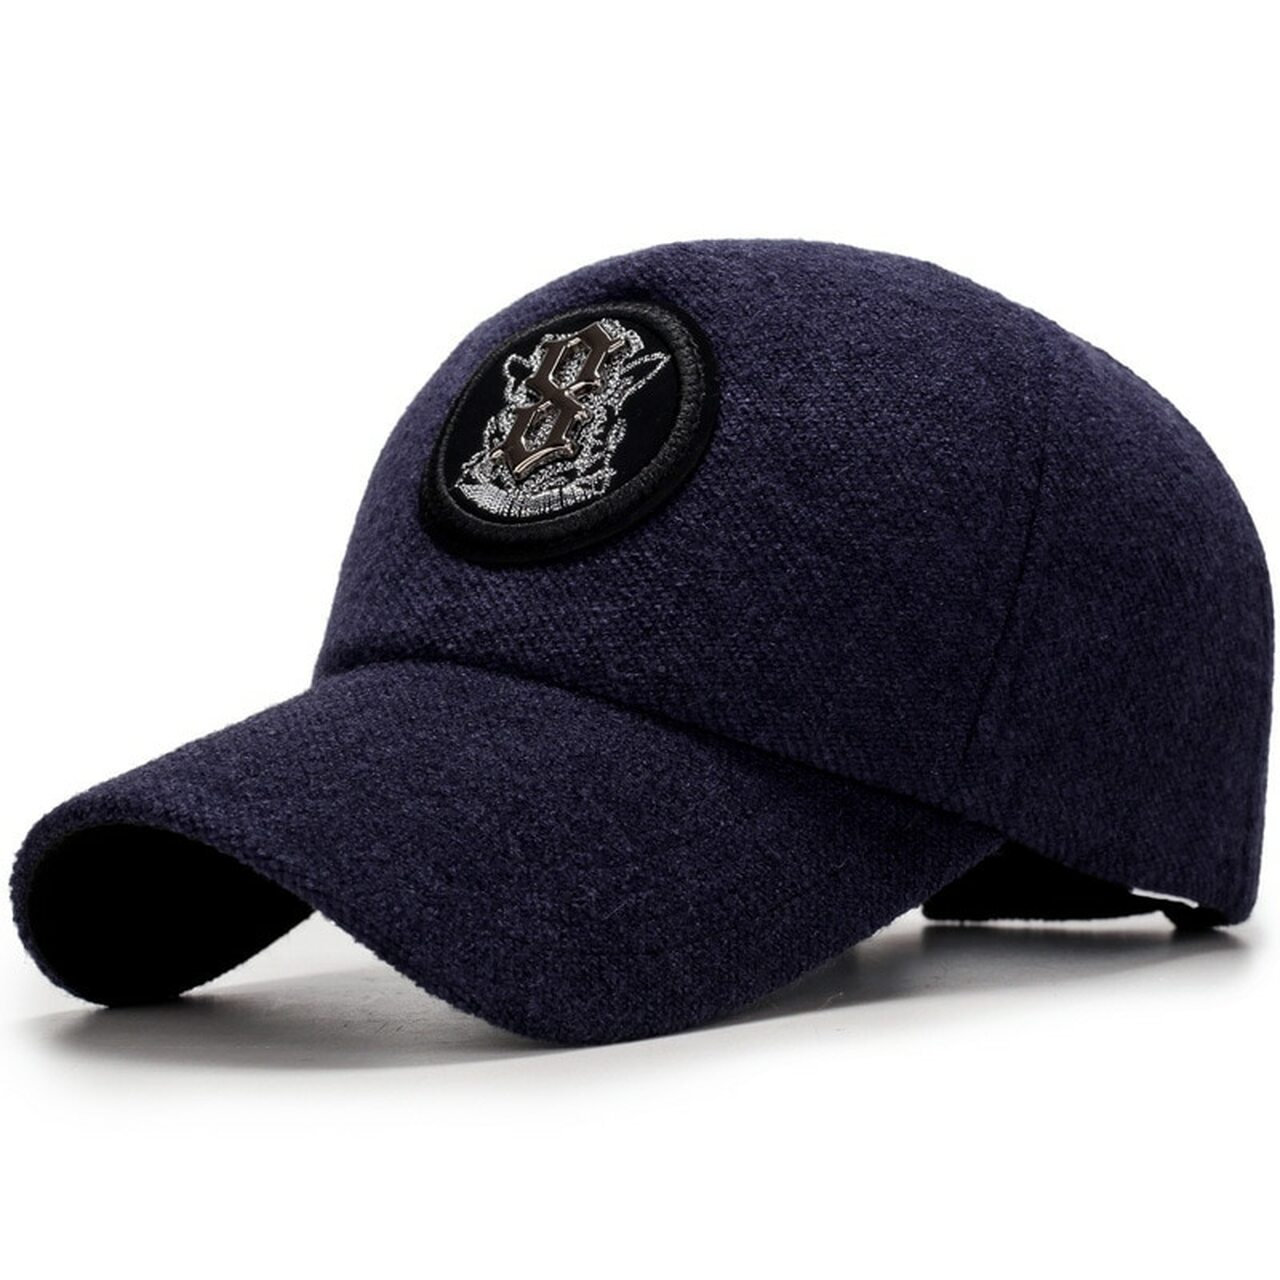 408d387a1e739c ... Baseball Cap Mens Hat Spring Chance The Rapper Hats Custom Snapback  Cowboy Man Black Luxury Brand ...